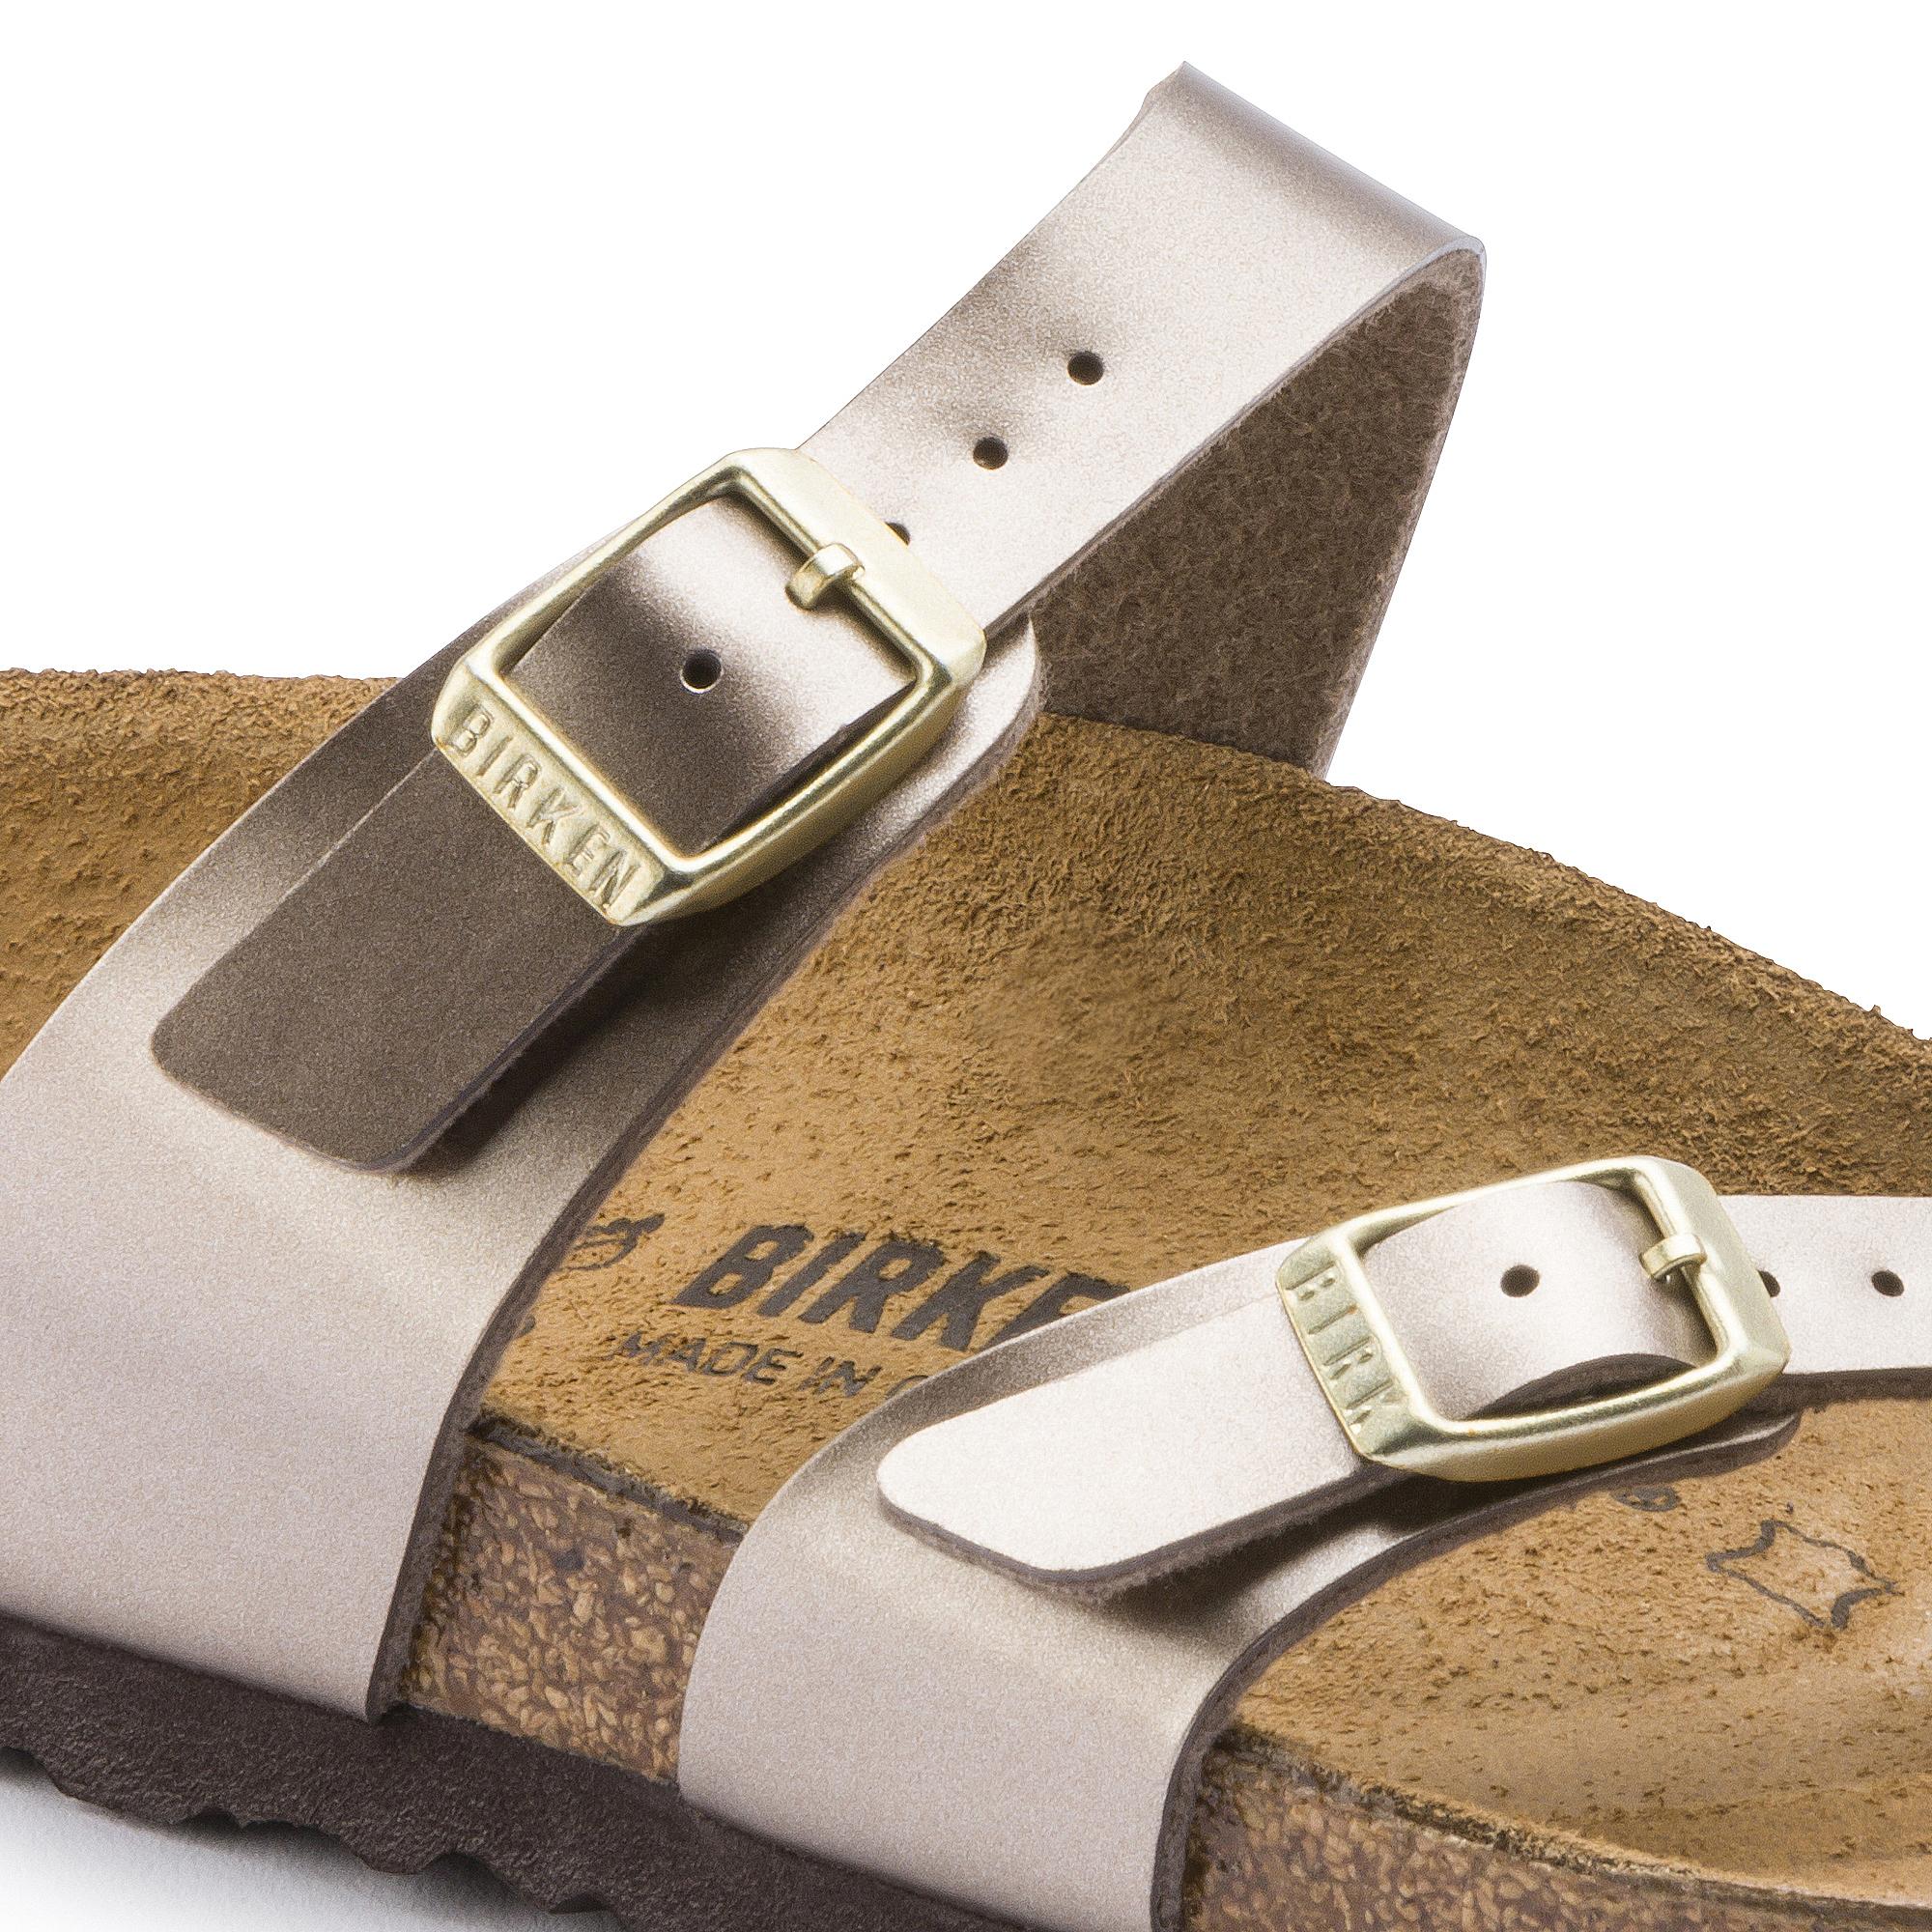 Birkenstock Mayari (Electric Metallic Taupe Birko Flor) Women's Sandals